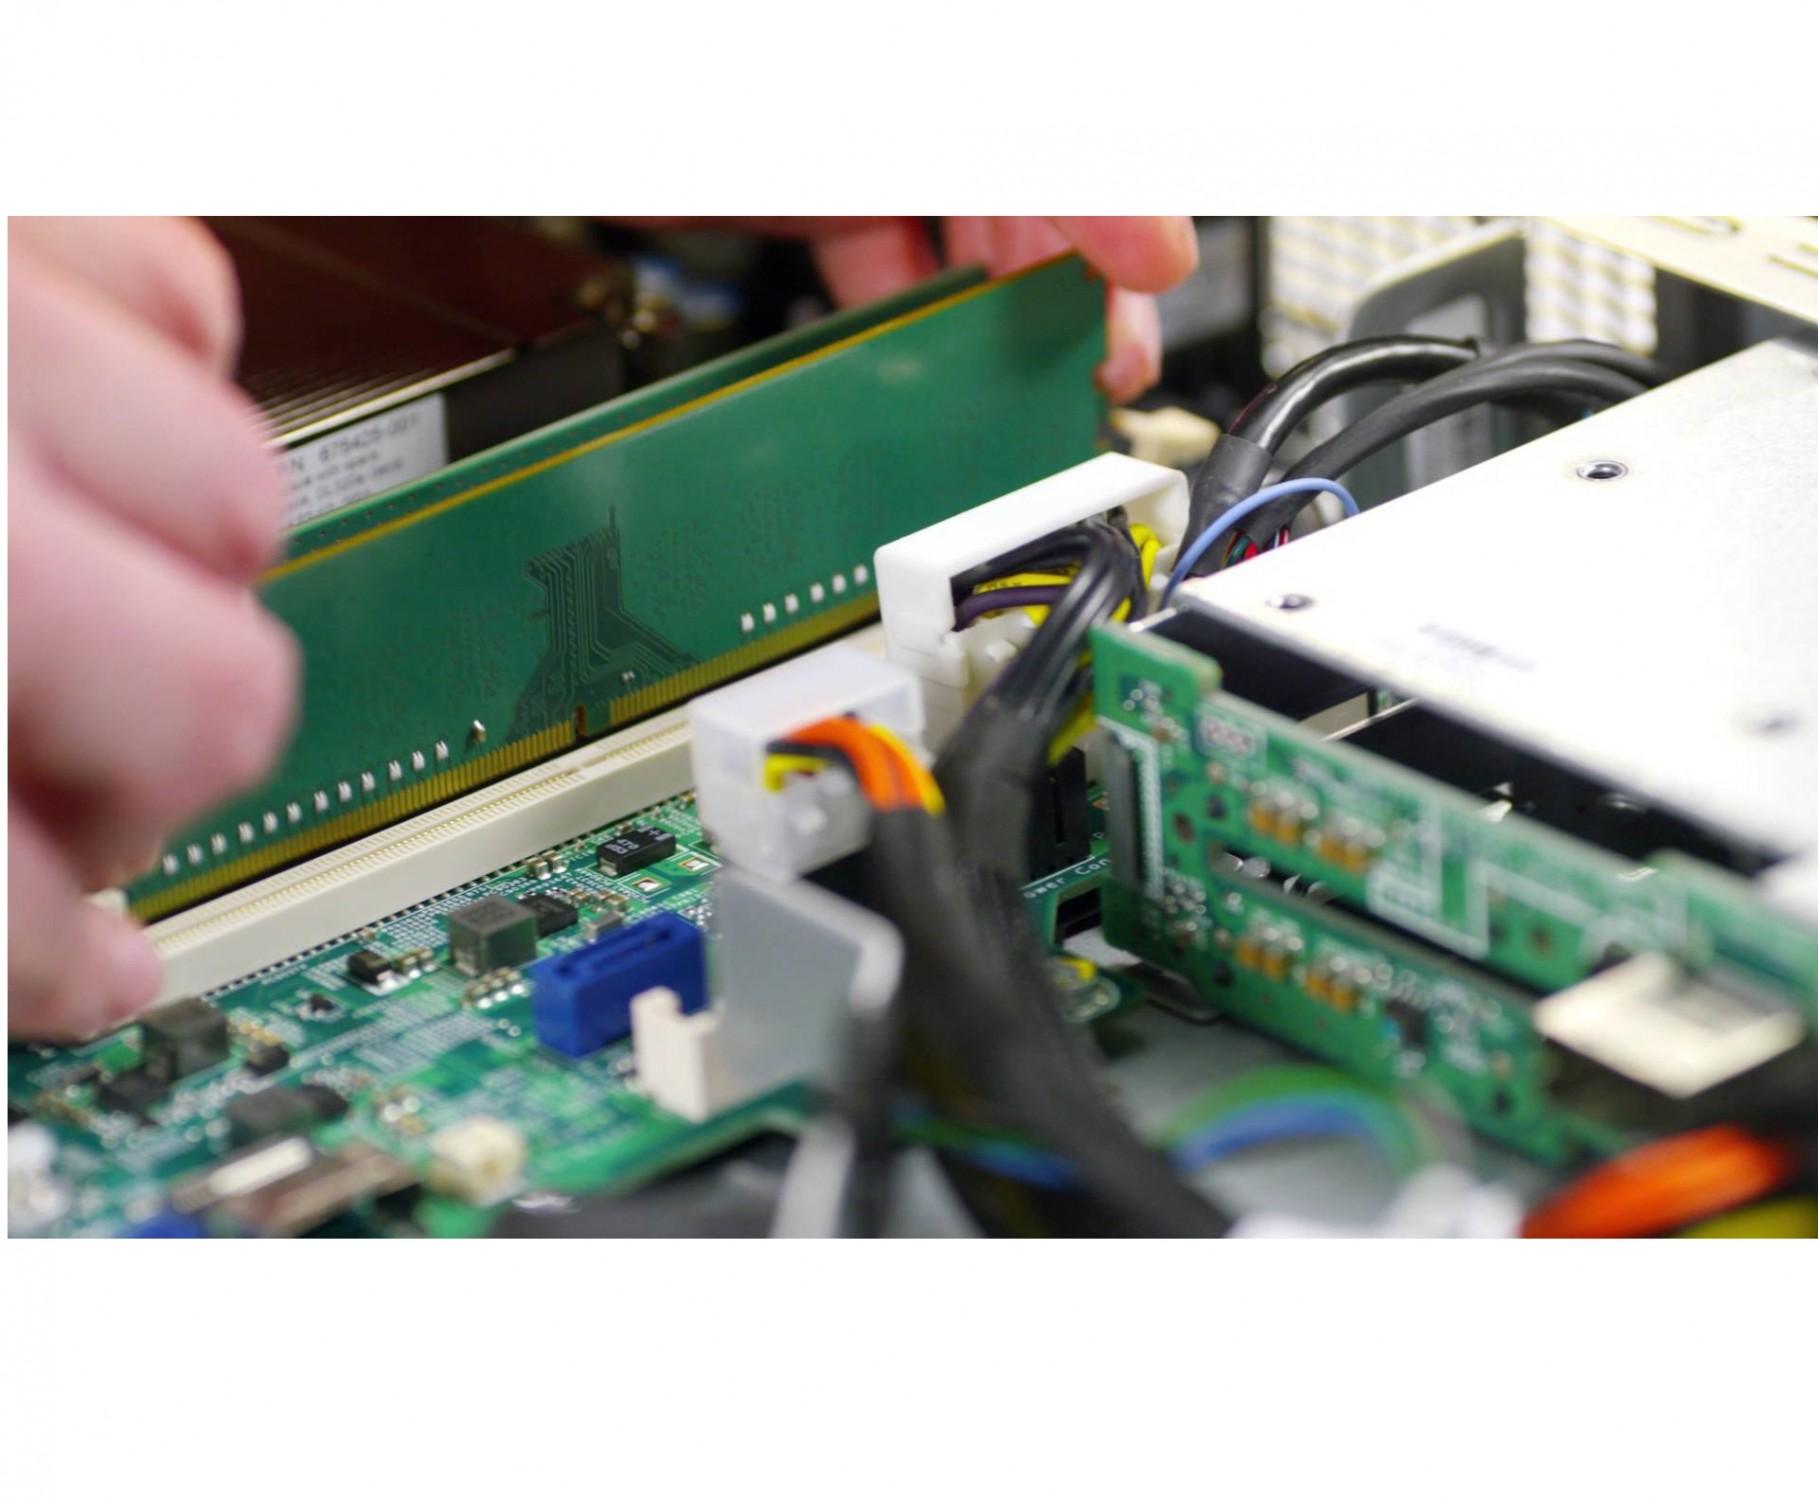 DL20 Gen9 E3-1220v5 3.0Ghz 1P 4C 8GB, 2LFF, SR B140i, SATA, non-HDD, 290W (819785-B21)